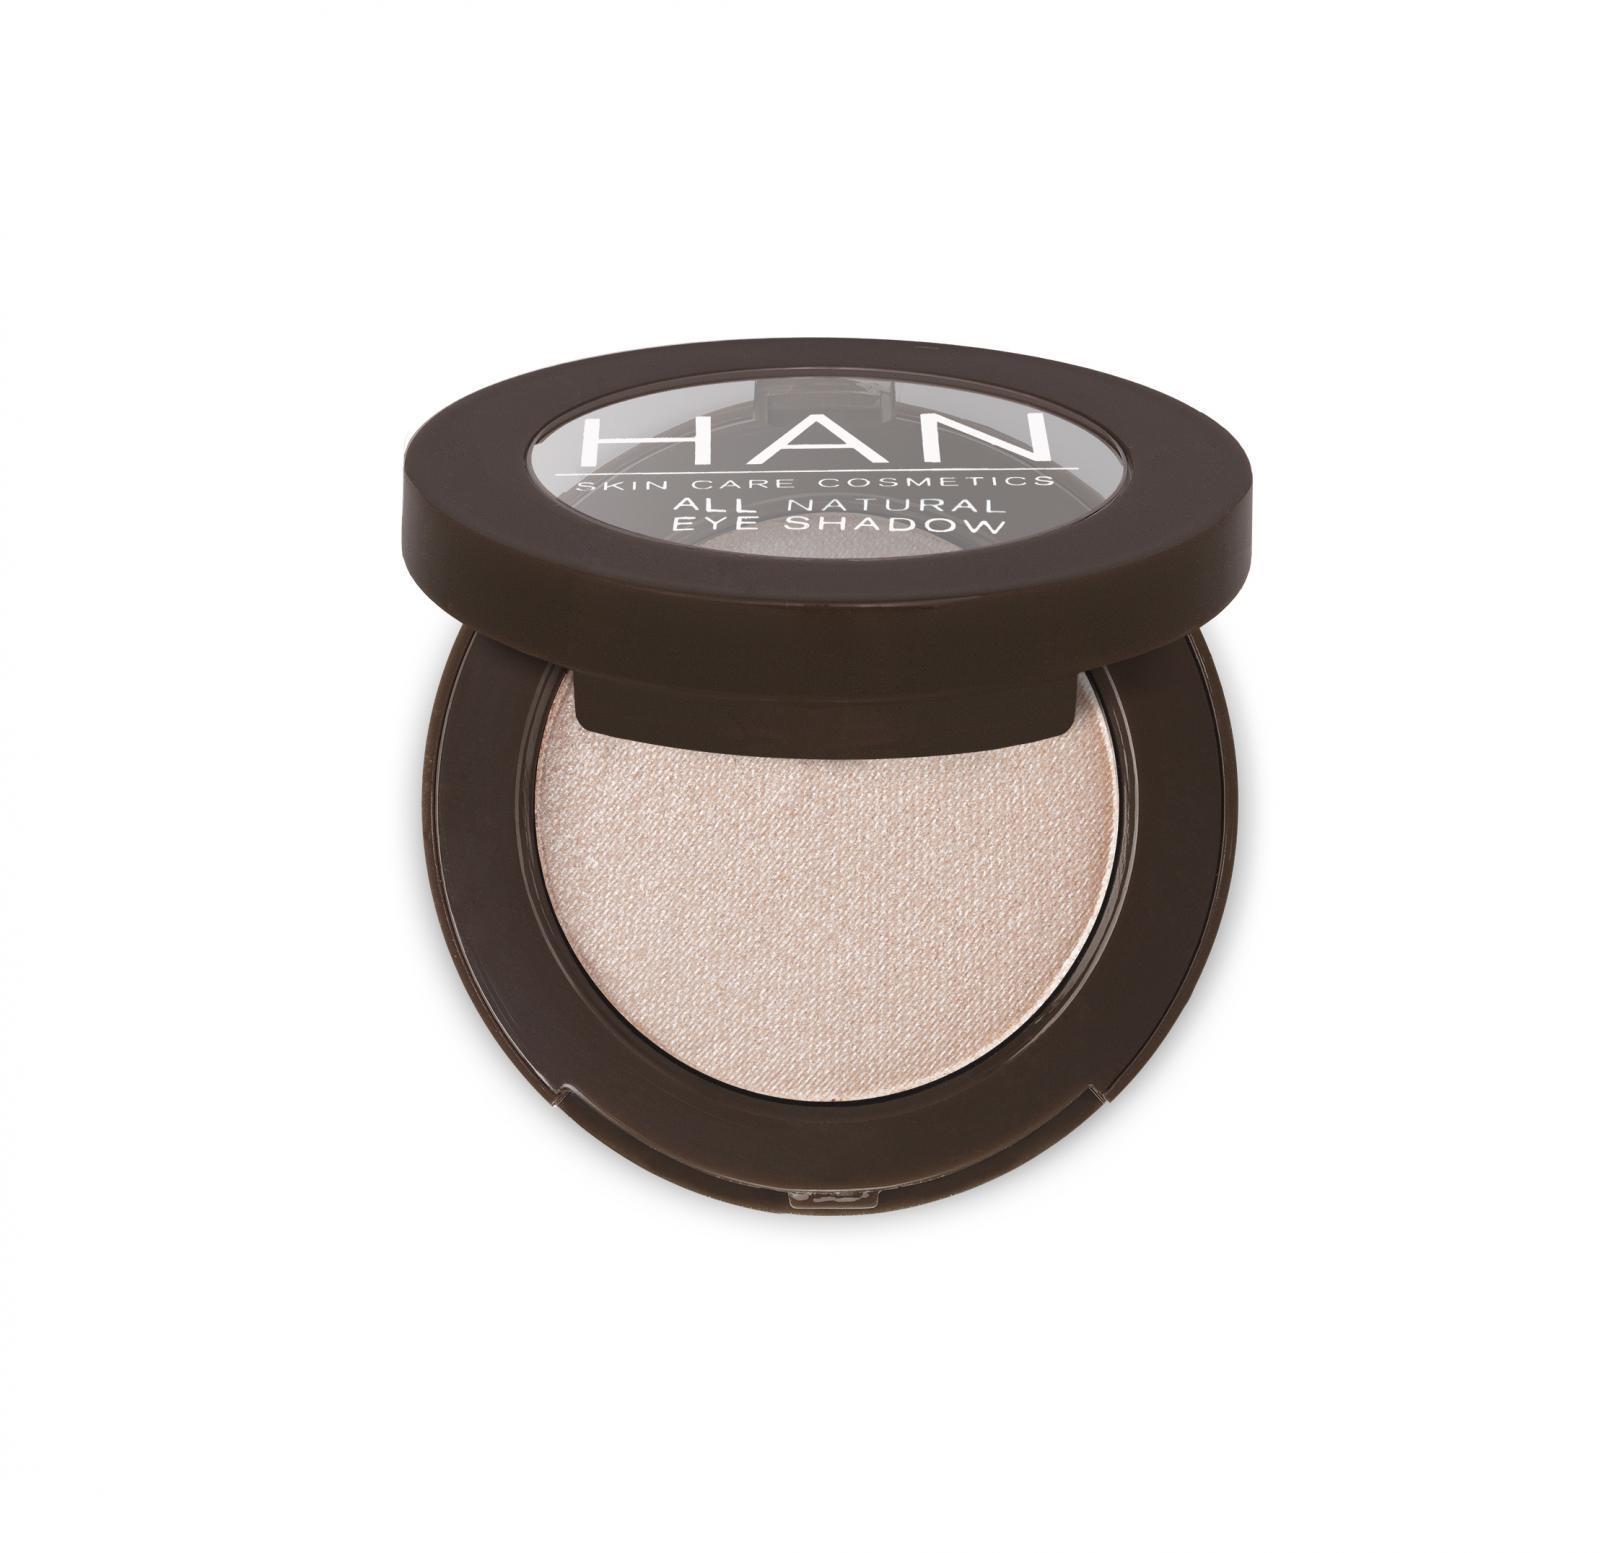 HAN Skin Care Cosmetics Eye Shadow - Celebrate